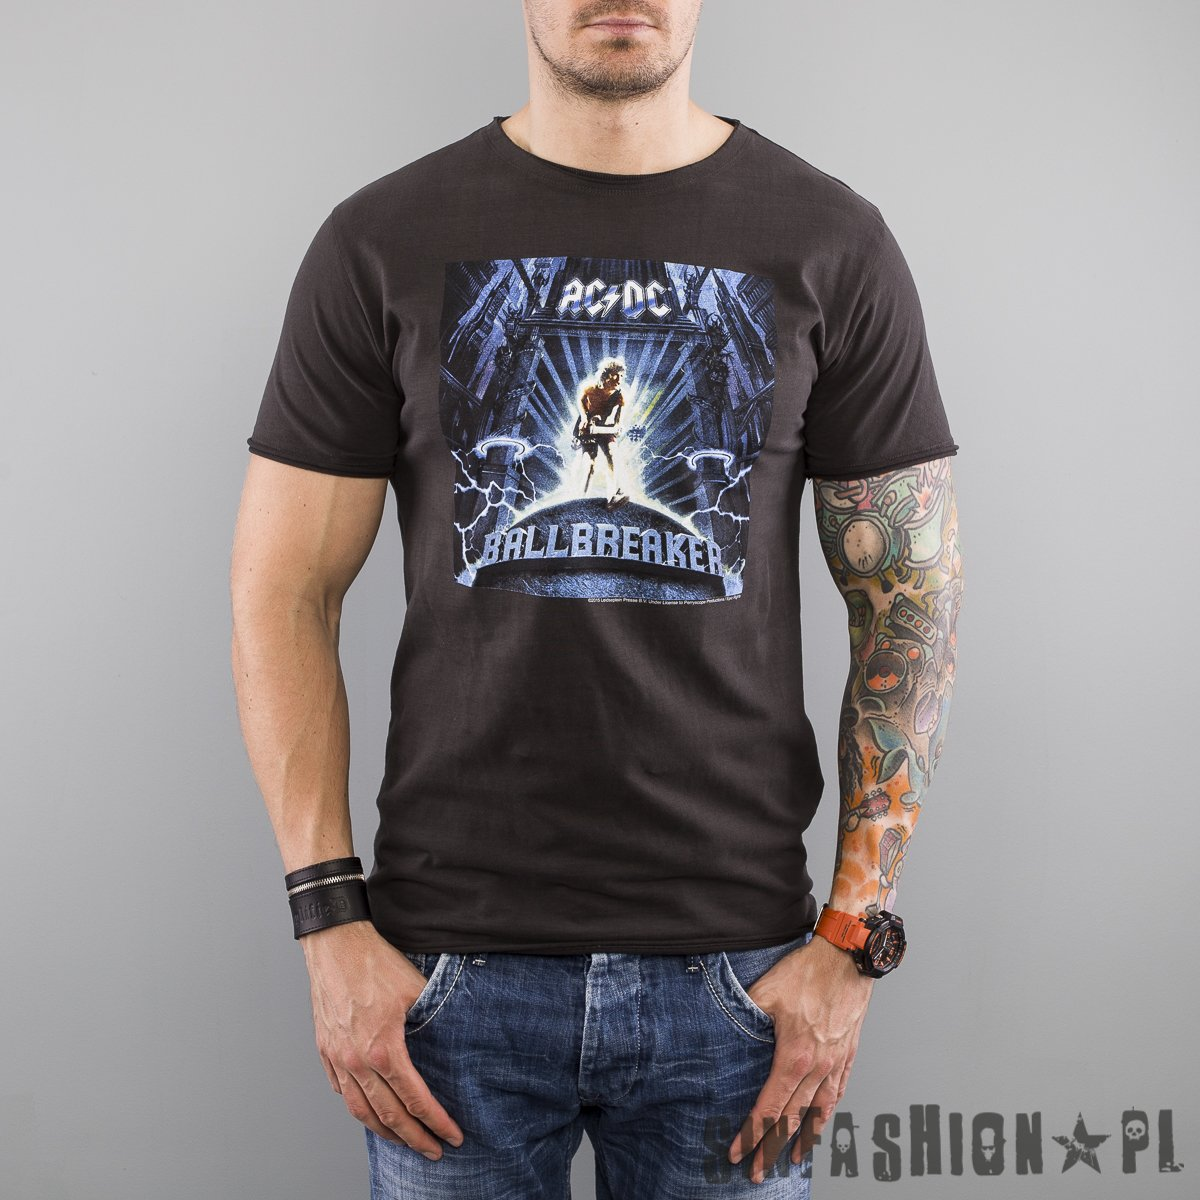 5d0c2febc KOSZULKA AMPLIFIED AC/DC BALLBREAKER | Mężczyźni \ Koszulki \ Krótki ...